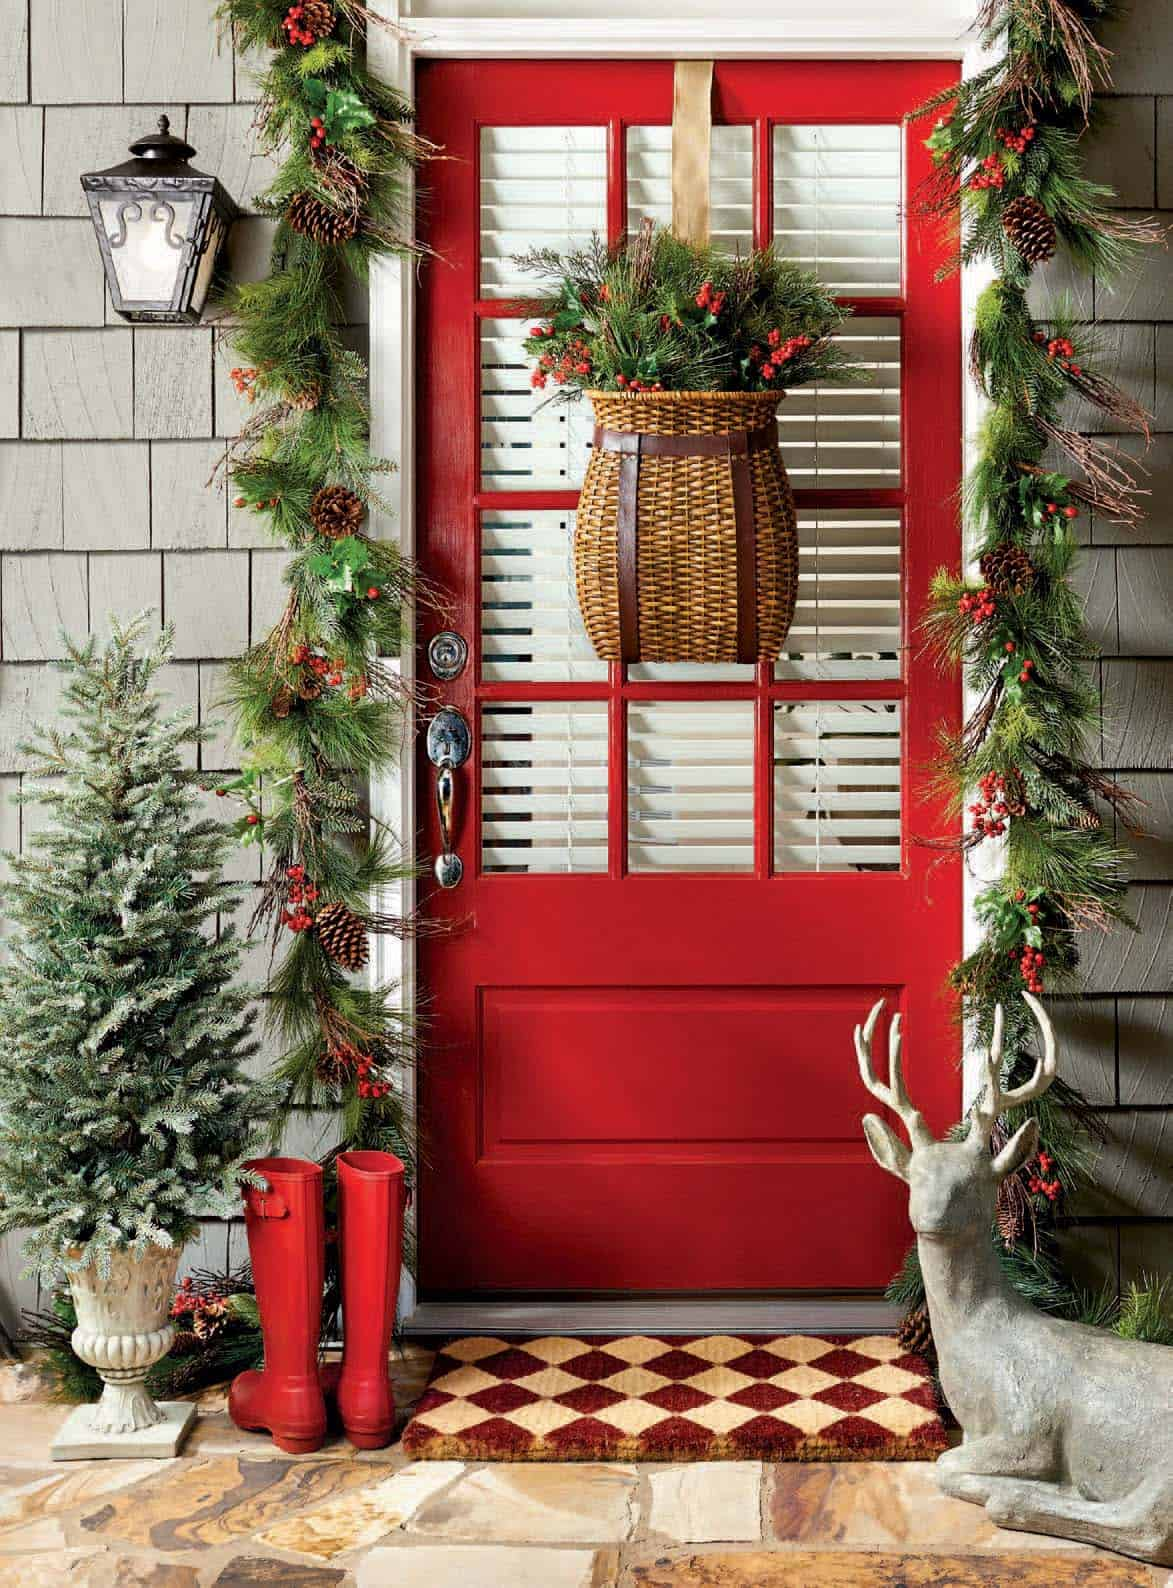 christmas-decor-ideas-rustic-country-15-1-kindesign